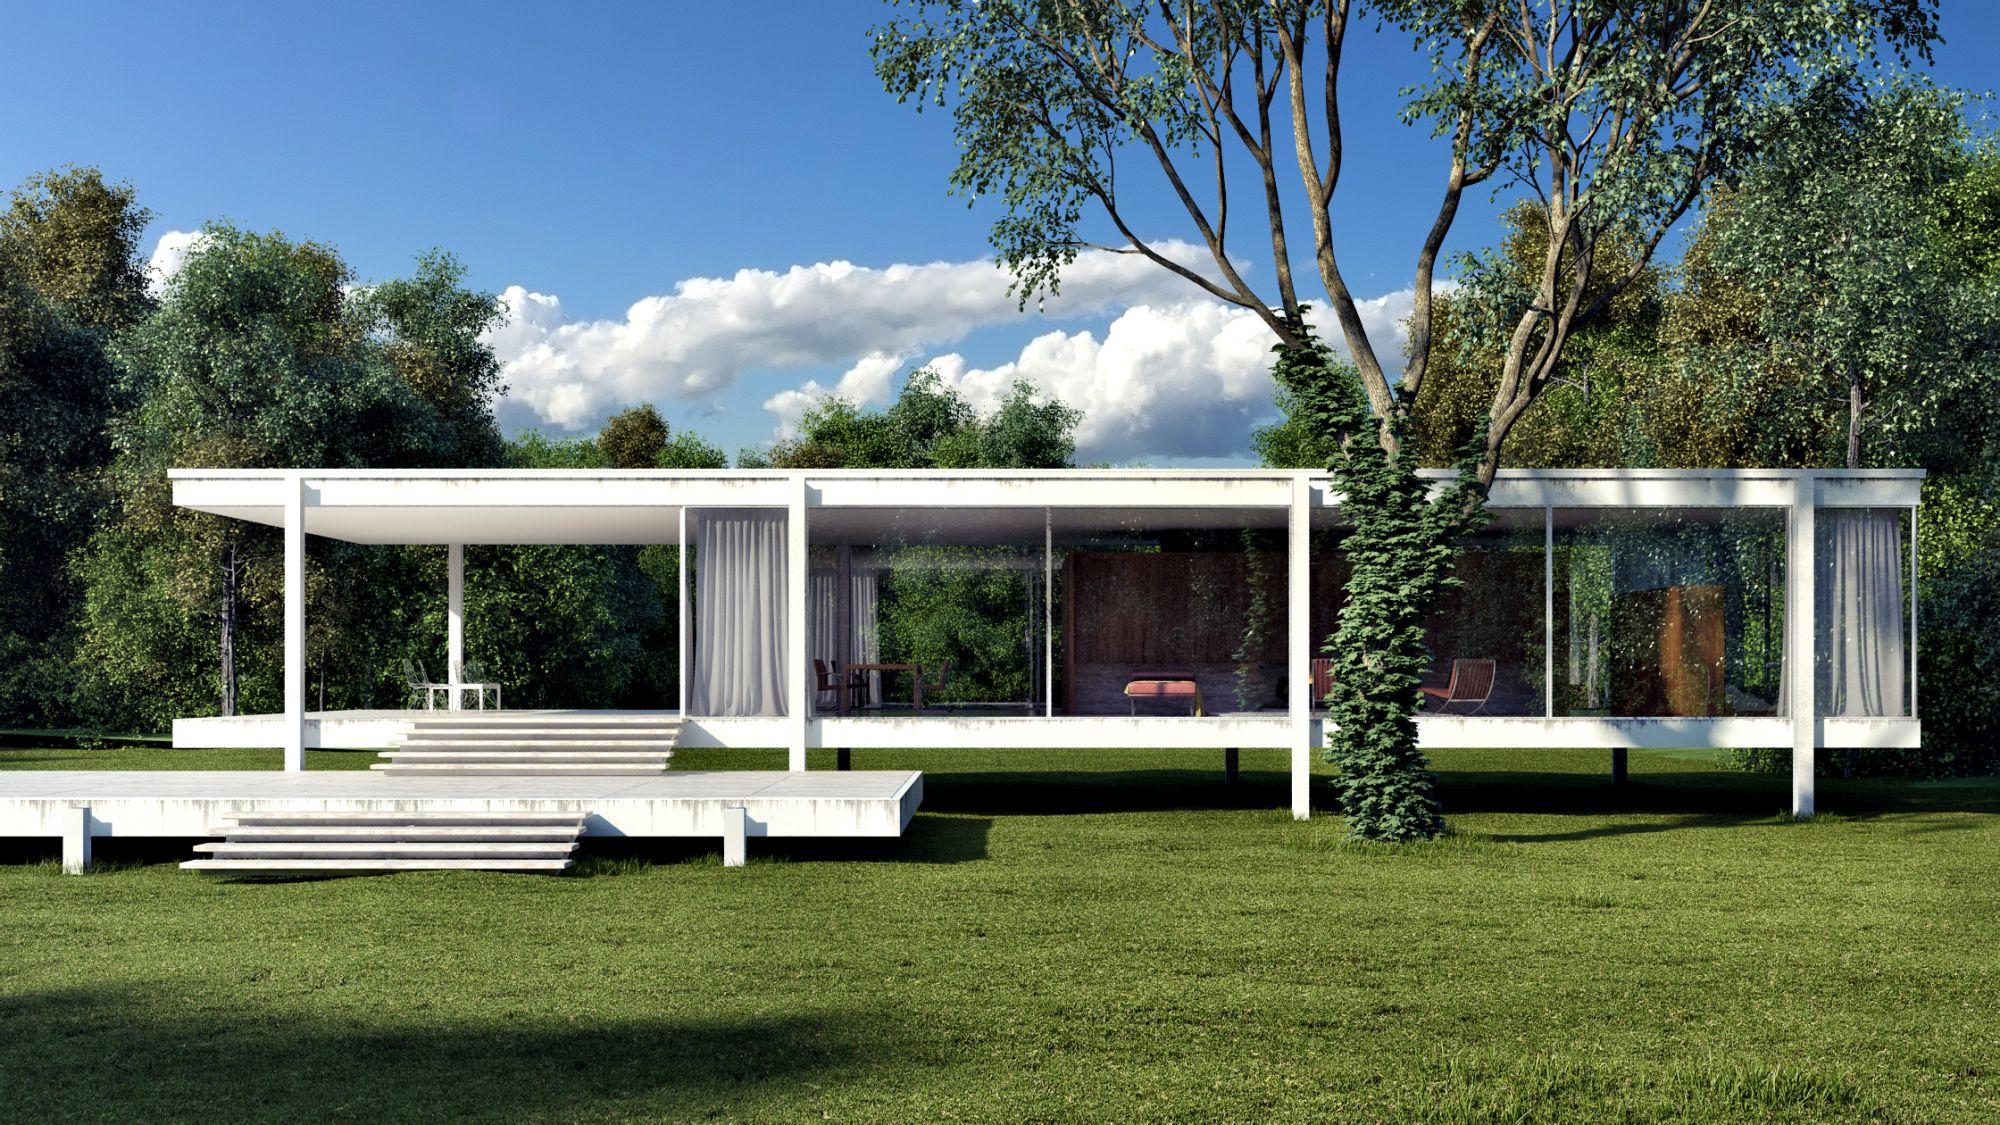 Ludwig Mies van der Rohe Casa Farnsworth  ComposizioneUnoA 2014